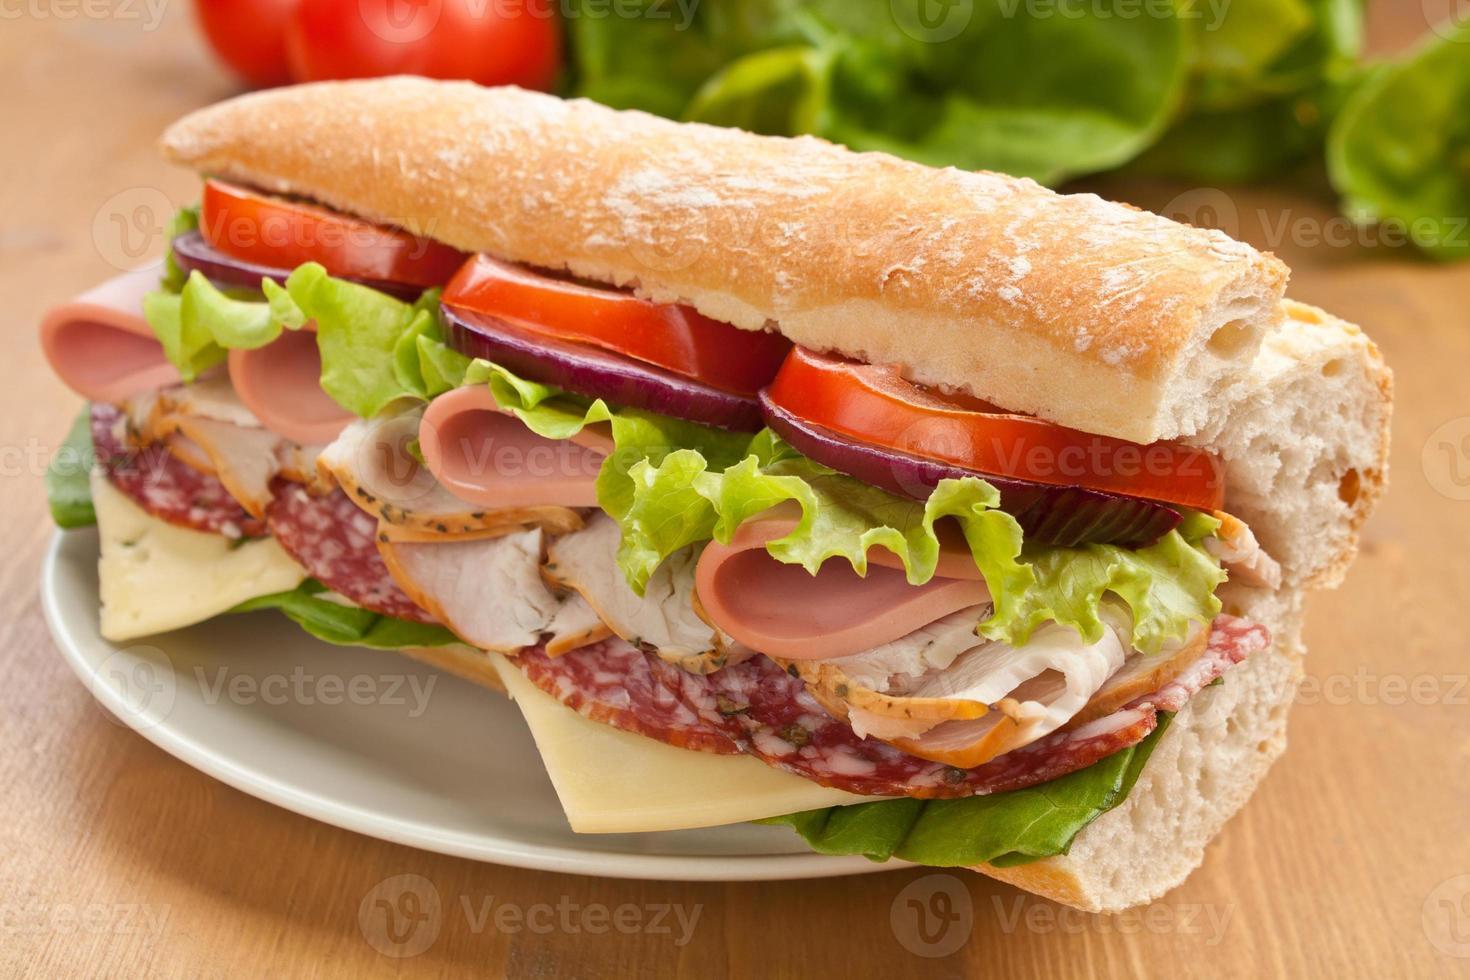 tunnelbana baguette smörgås foto